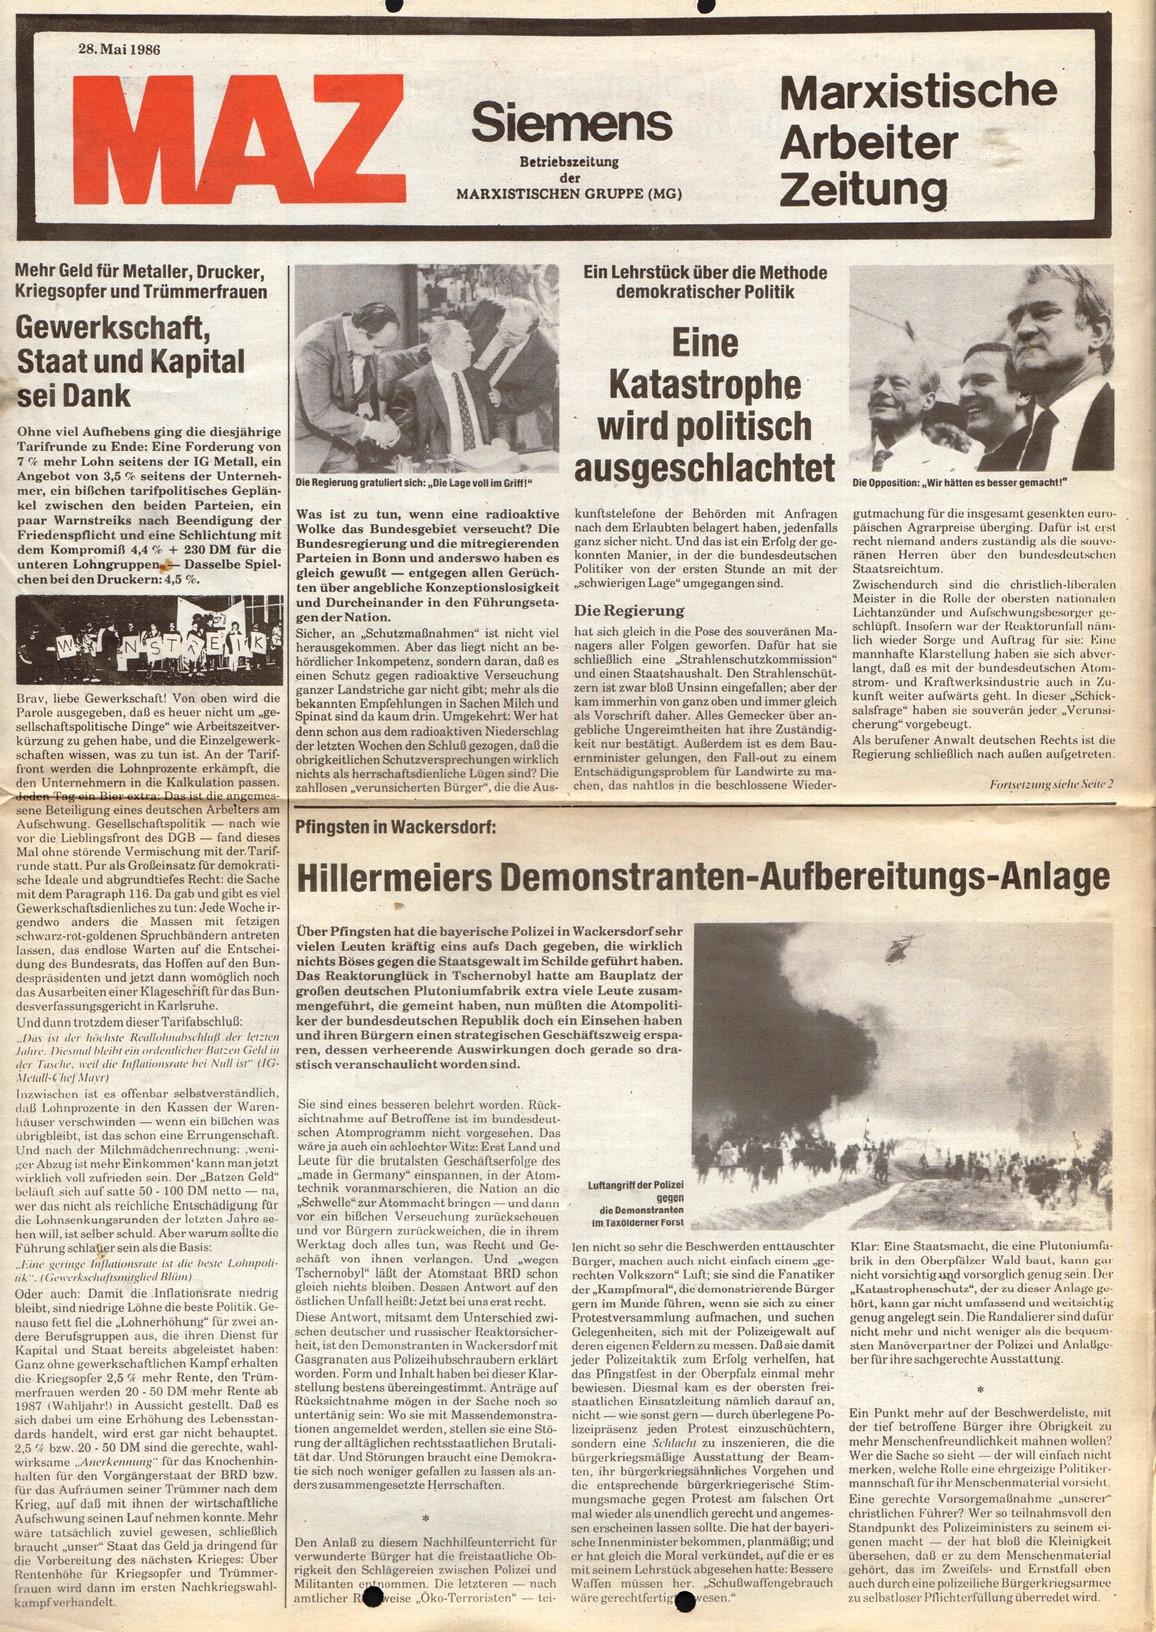 Muenchen_MG_MAZ_Siemens_19860528_01